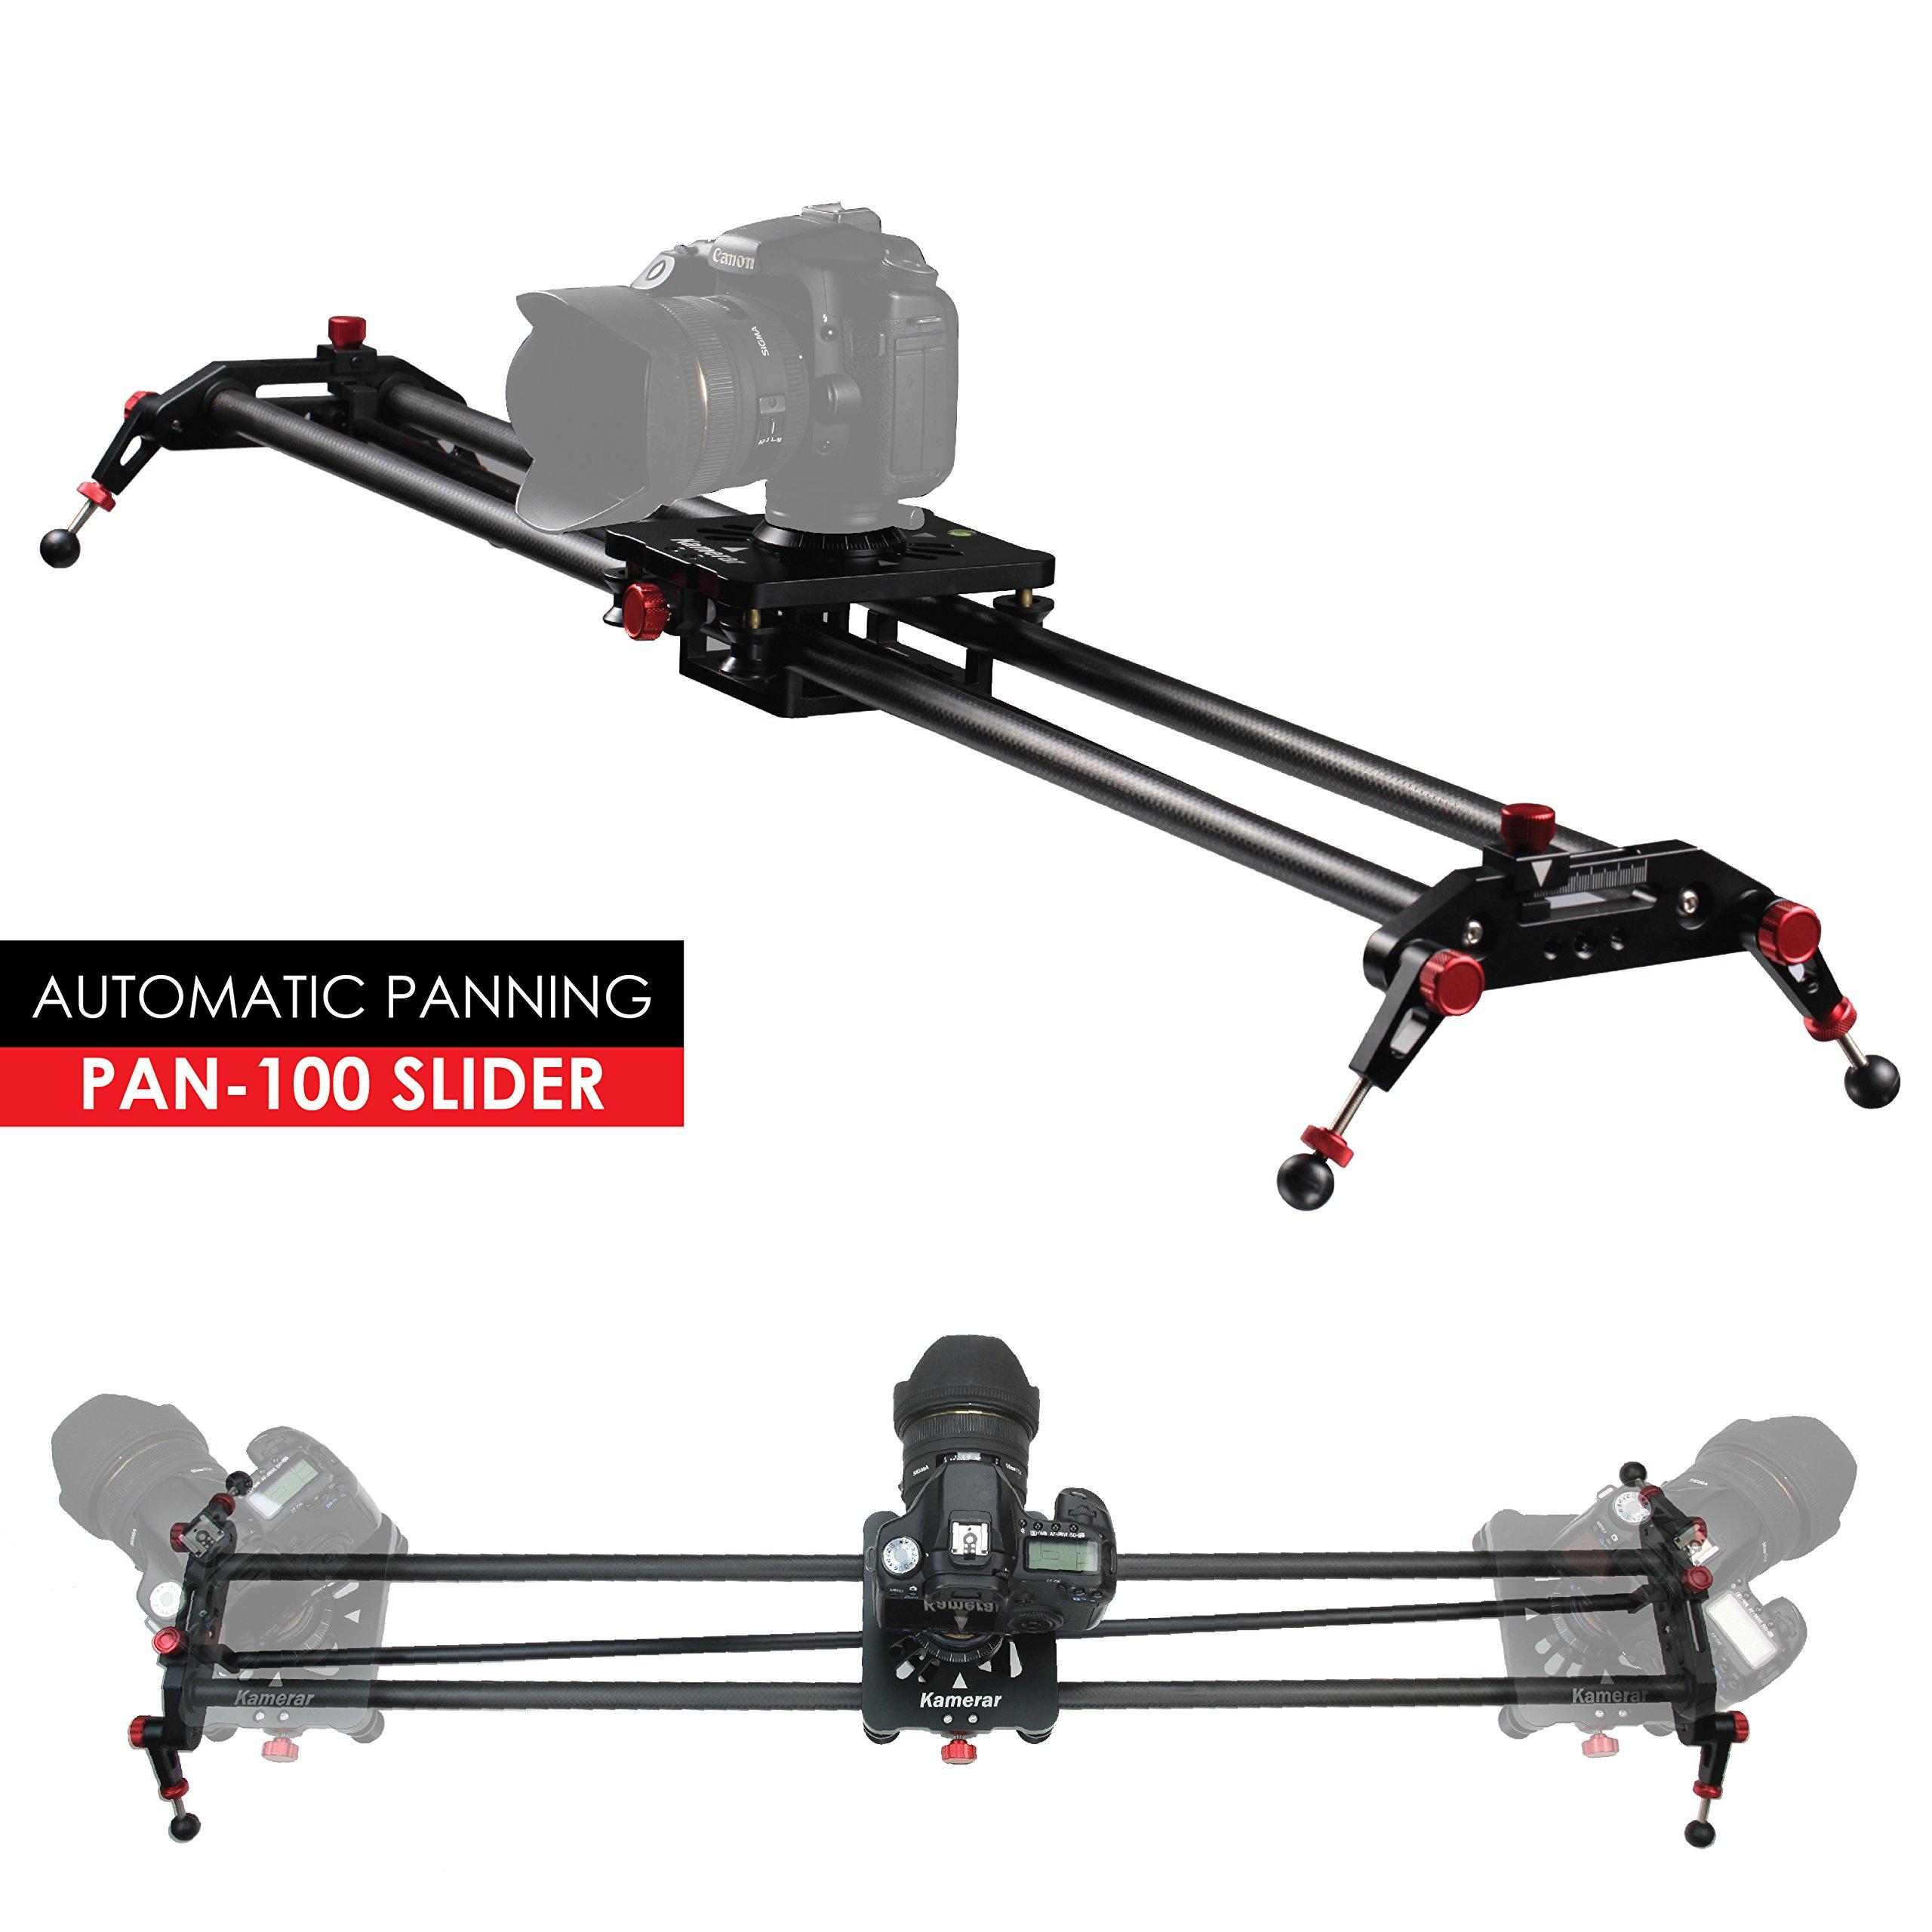 Kamerar 39.4 inch / 100 cm Pan-100 Track Motion Rail Stabilization DSLR Camera Slider: Light Carbon Fiber Rail, Adjustable Legs, Angle Follow Focus, Parallax Slide, Panoramic Slide